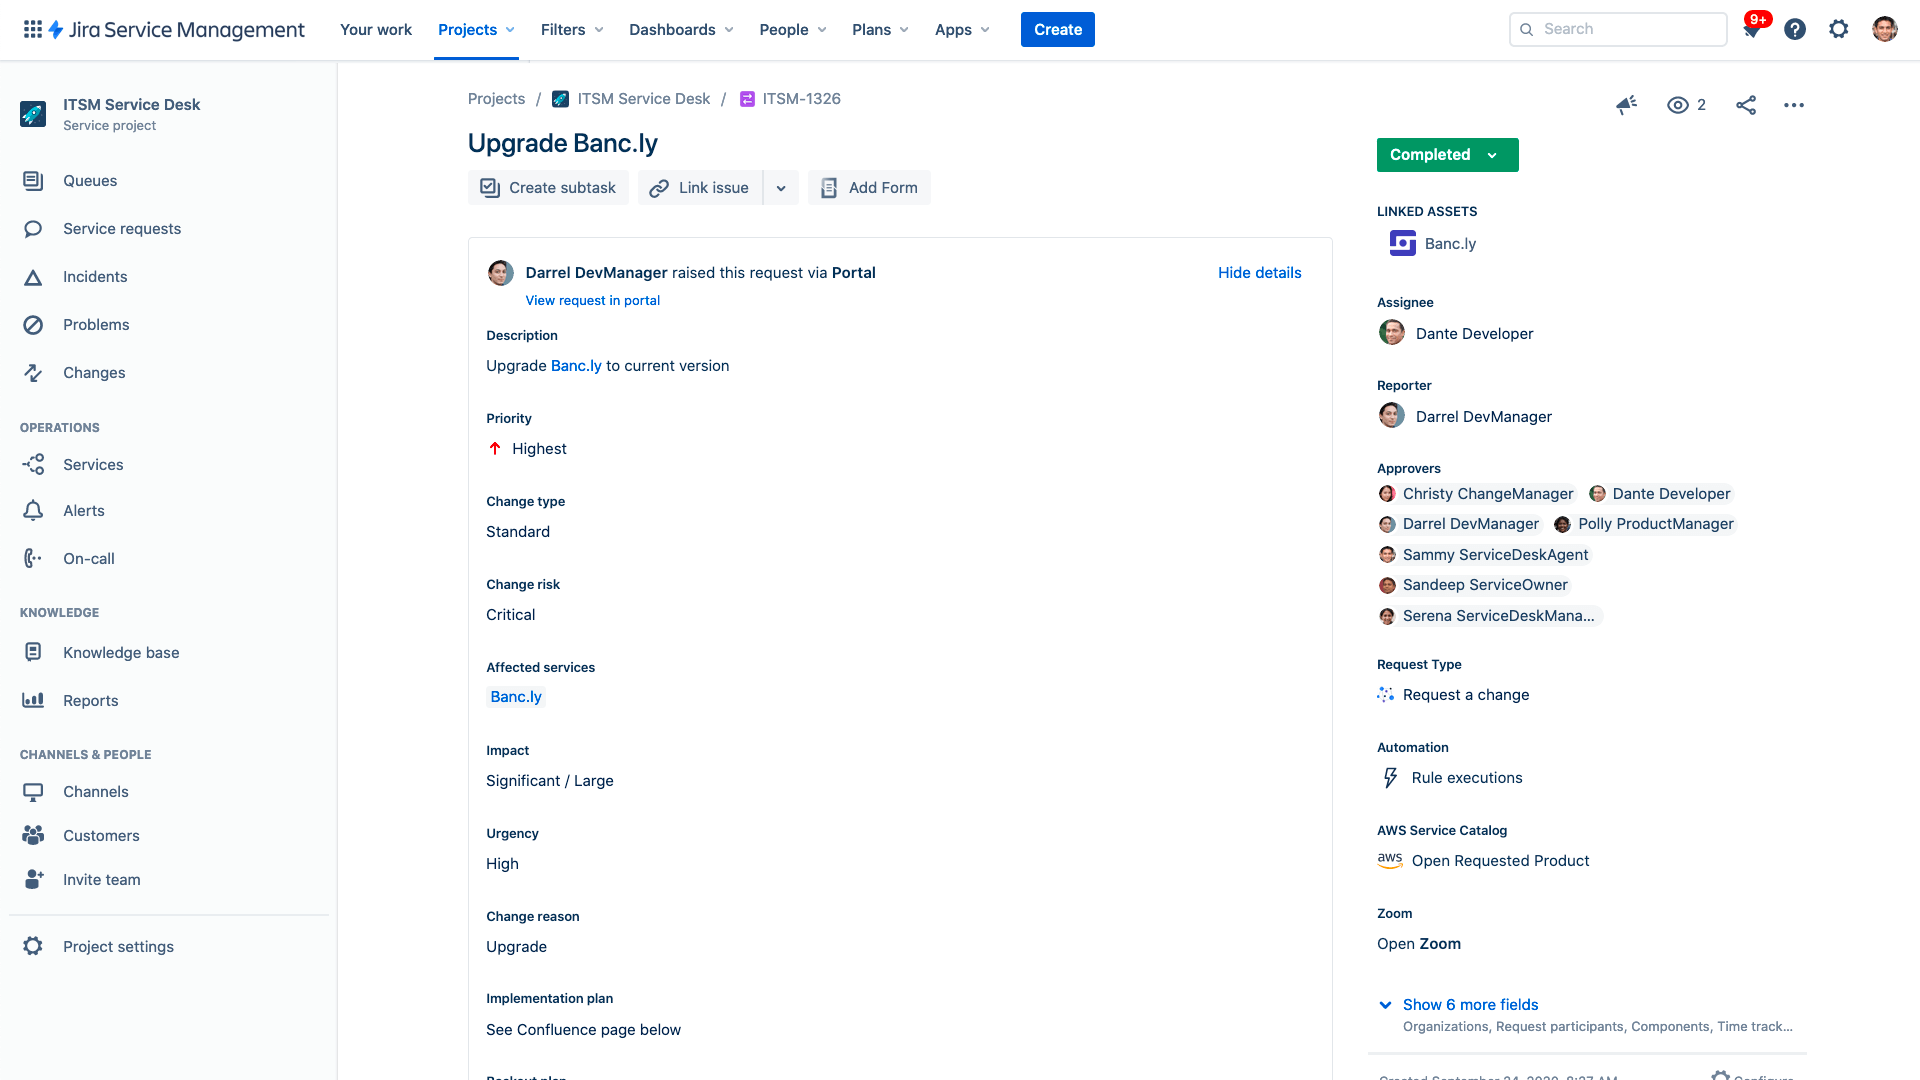 Change record screenshot